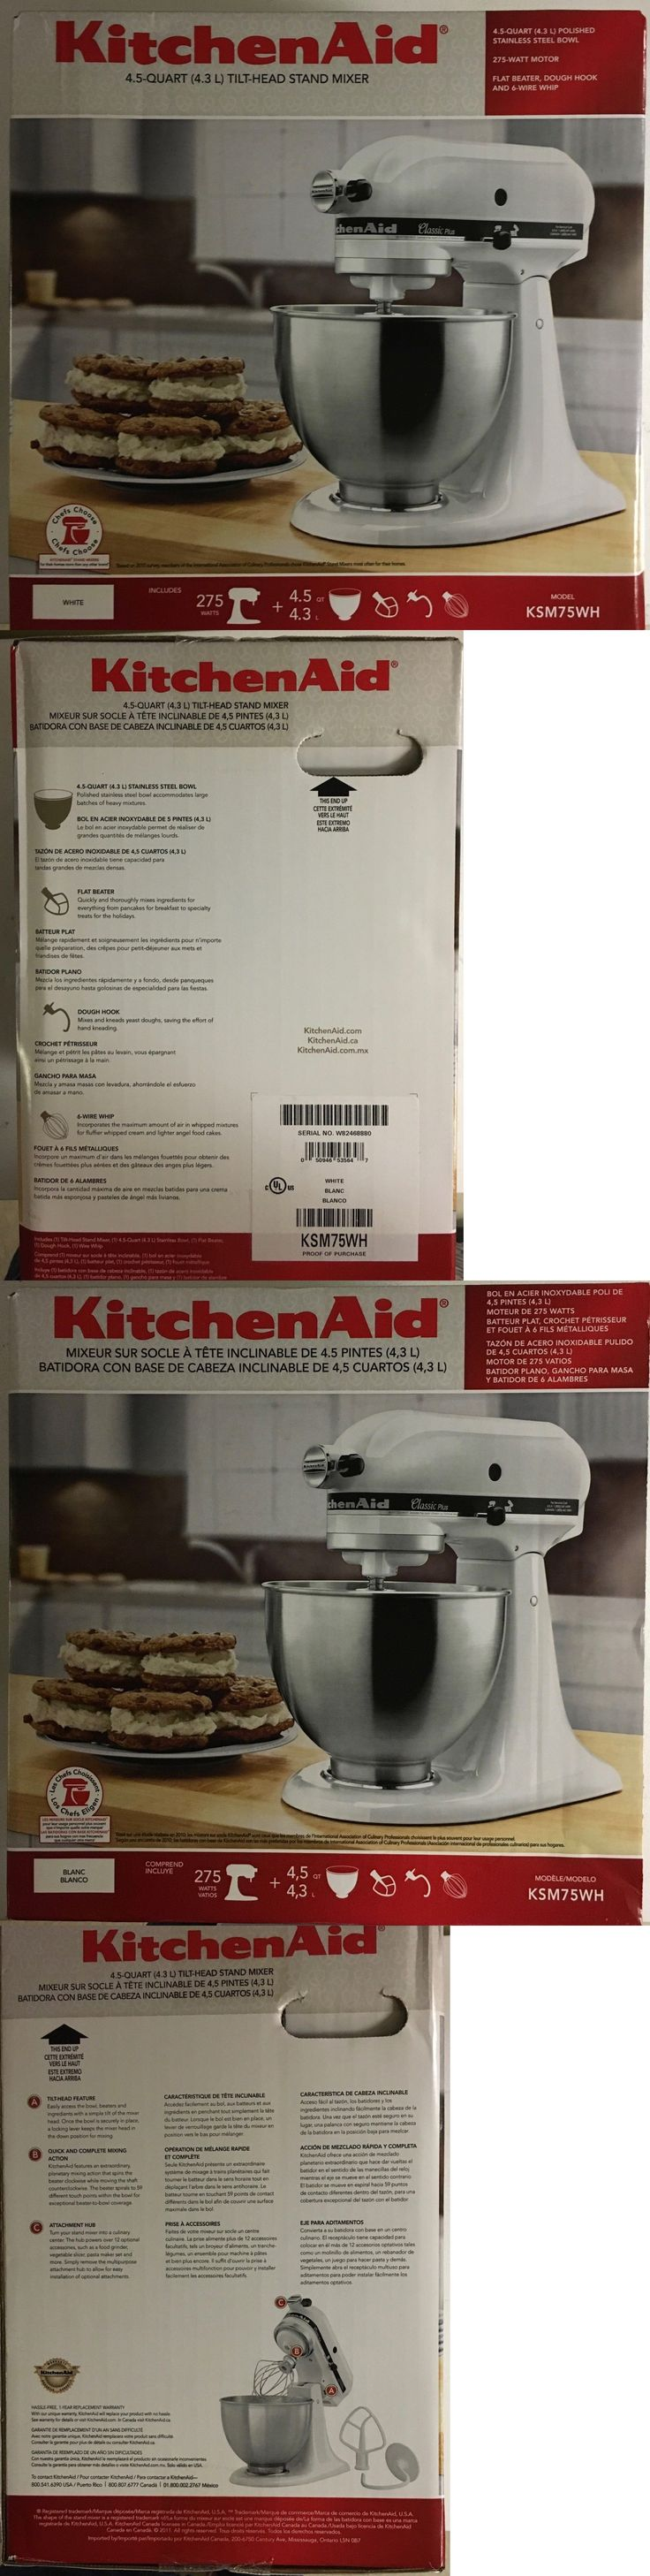 Countertop mixers 133701 new kitchenaid ksm75wh classic